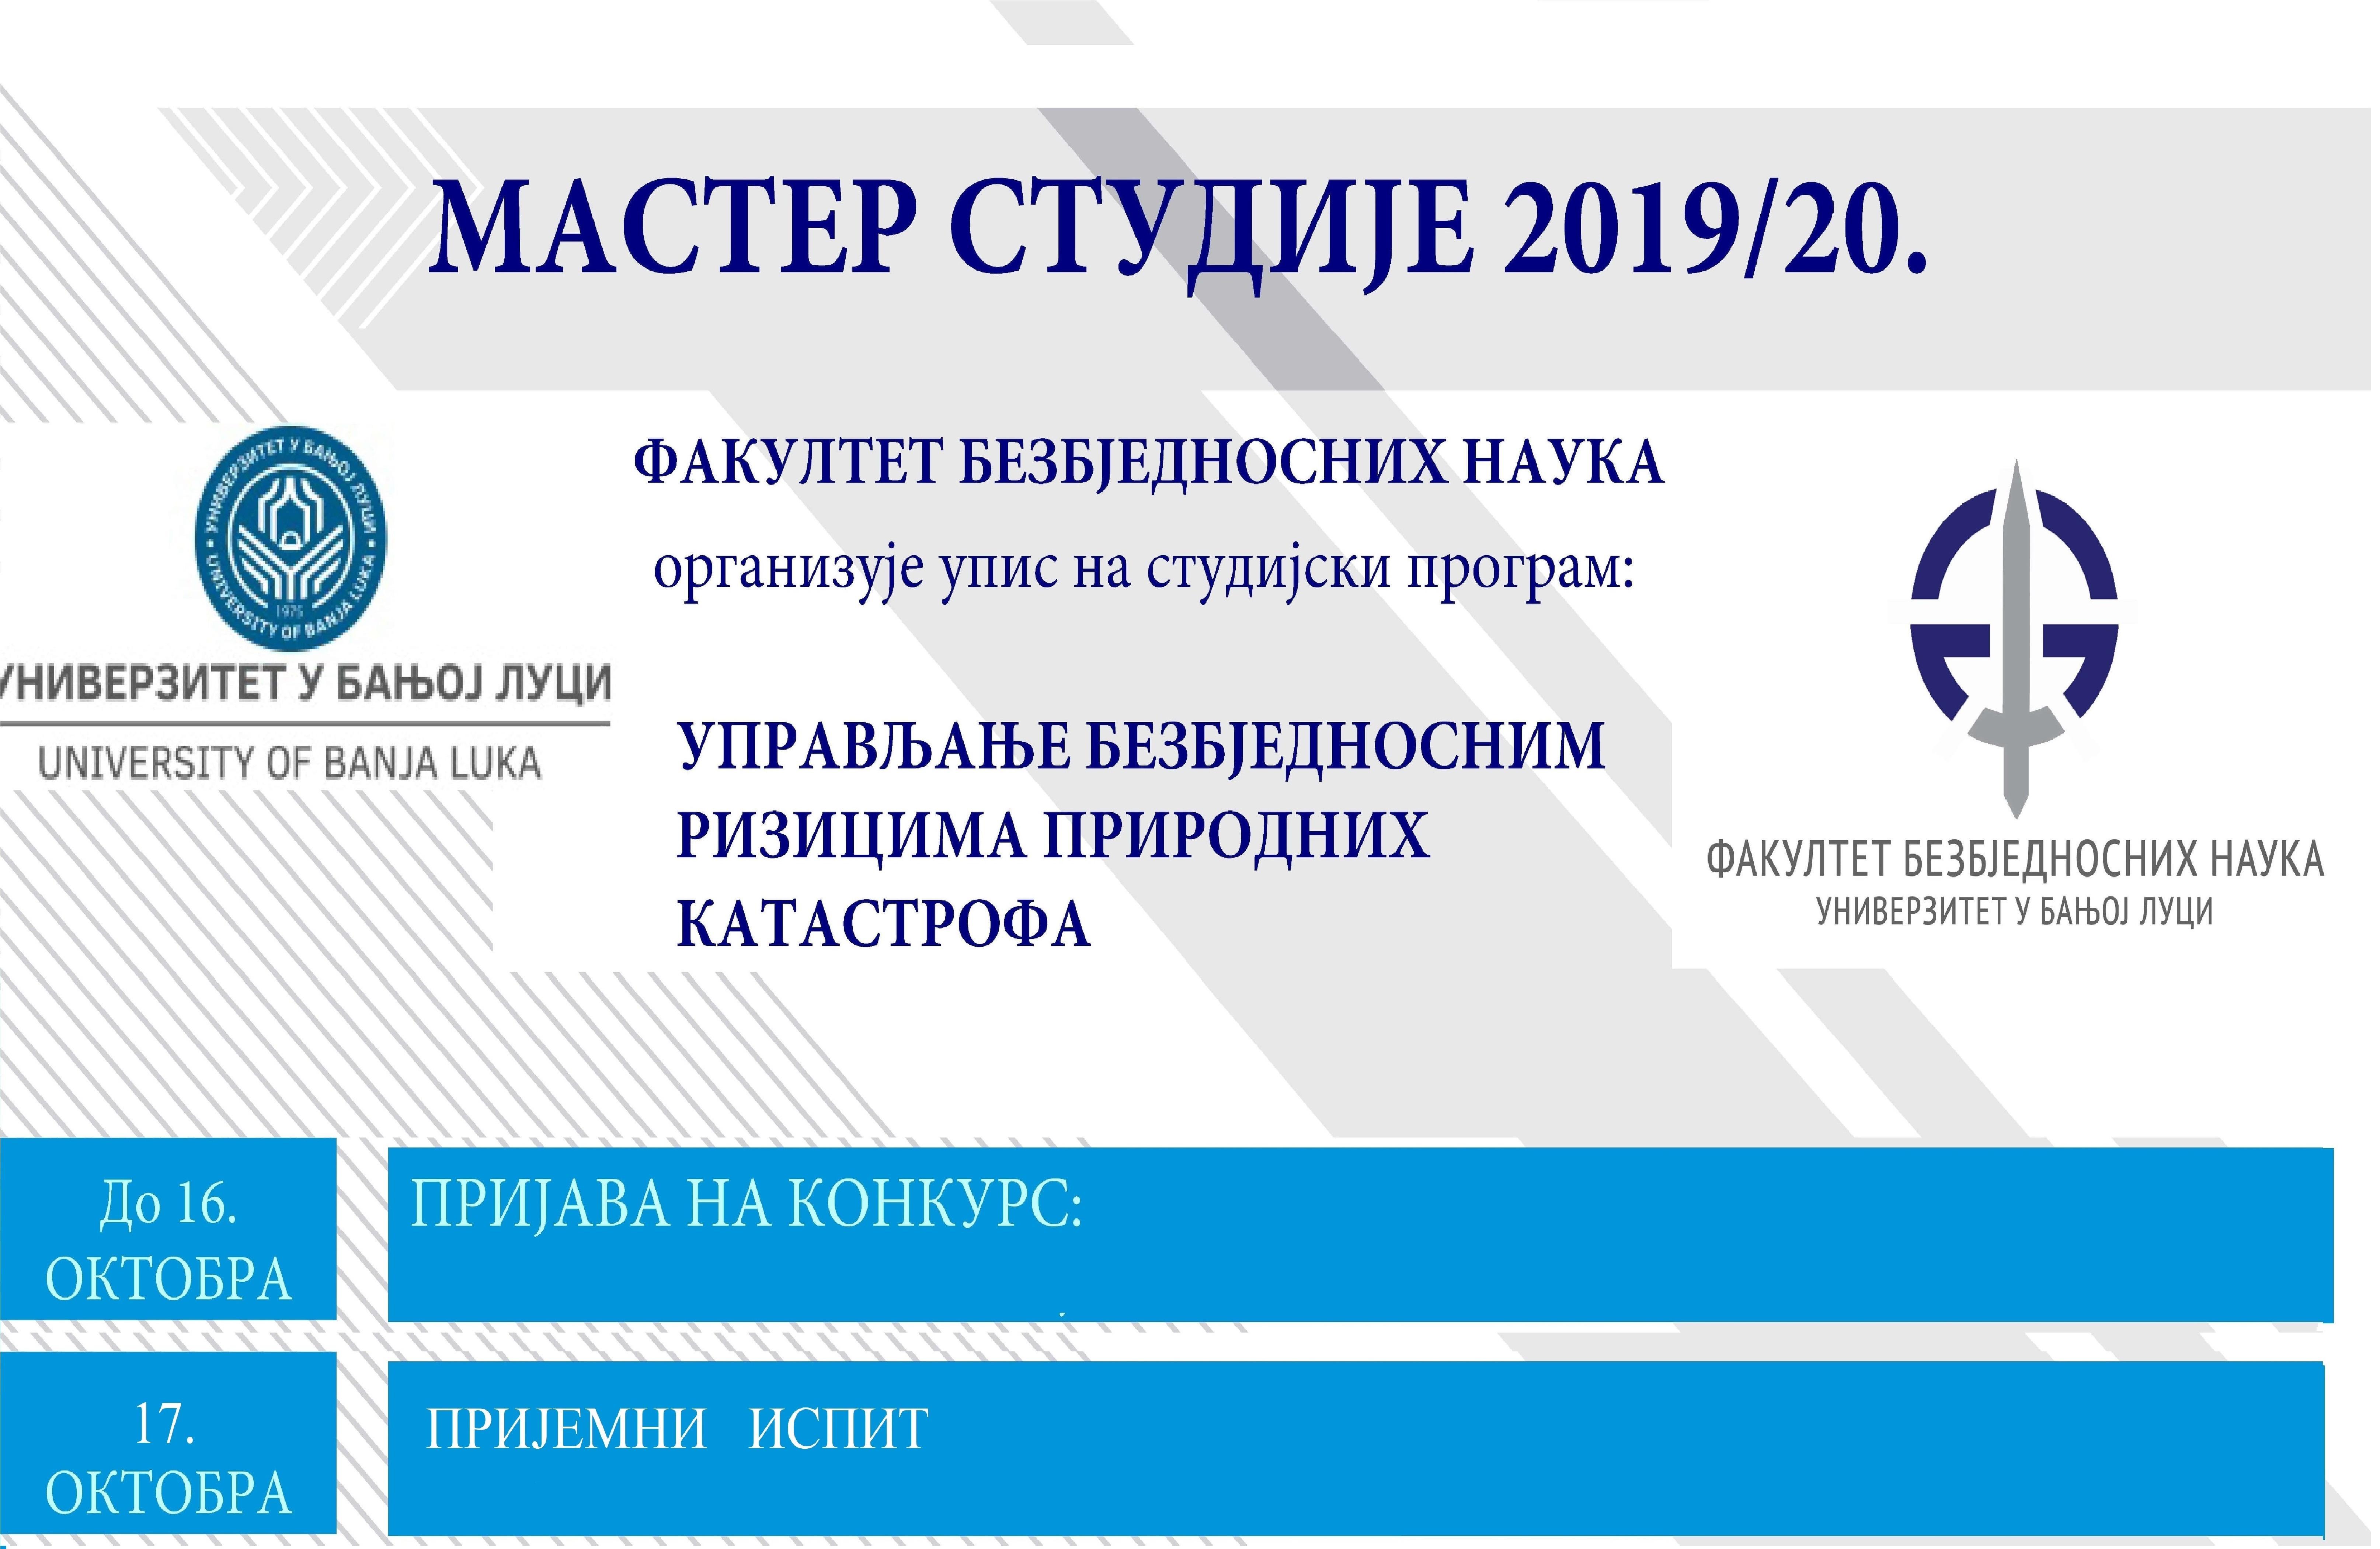 Инфо дан мастер студија  Источно Сарајево – Културни центар – 1. октобар